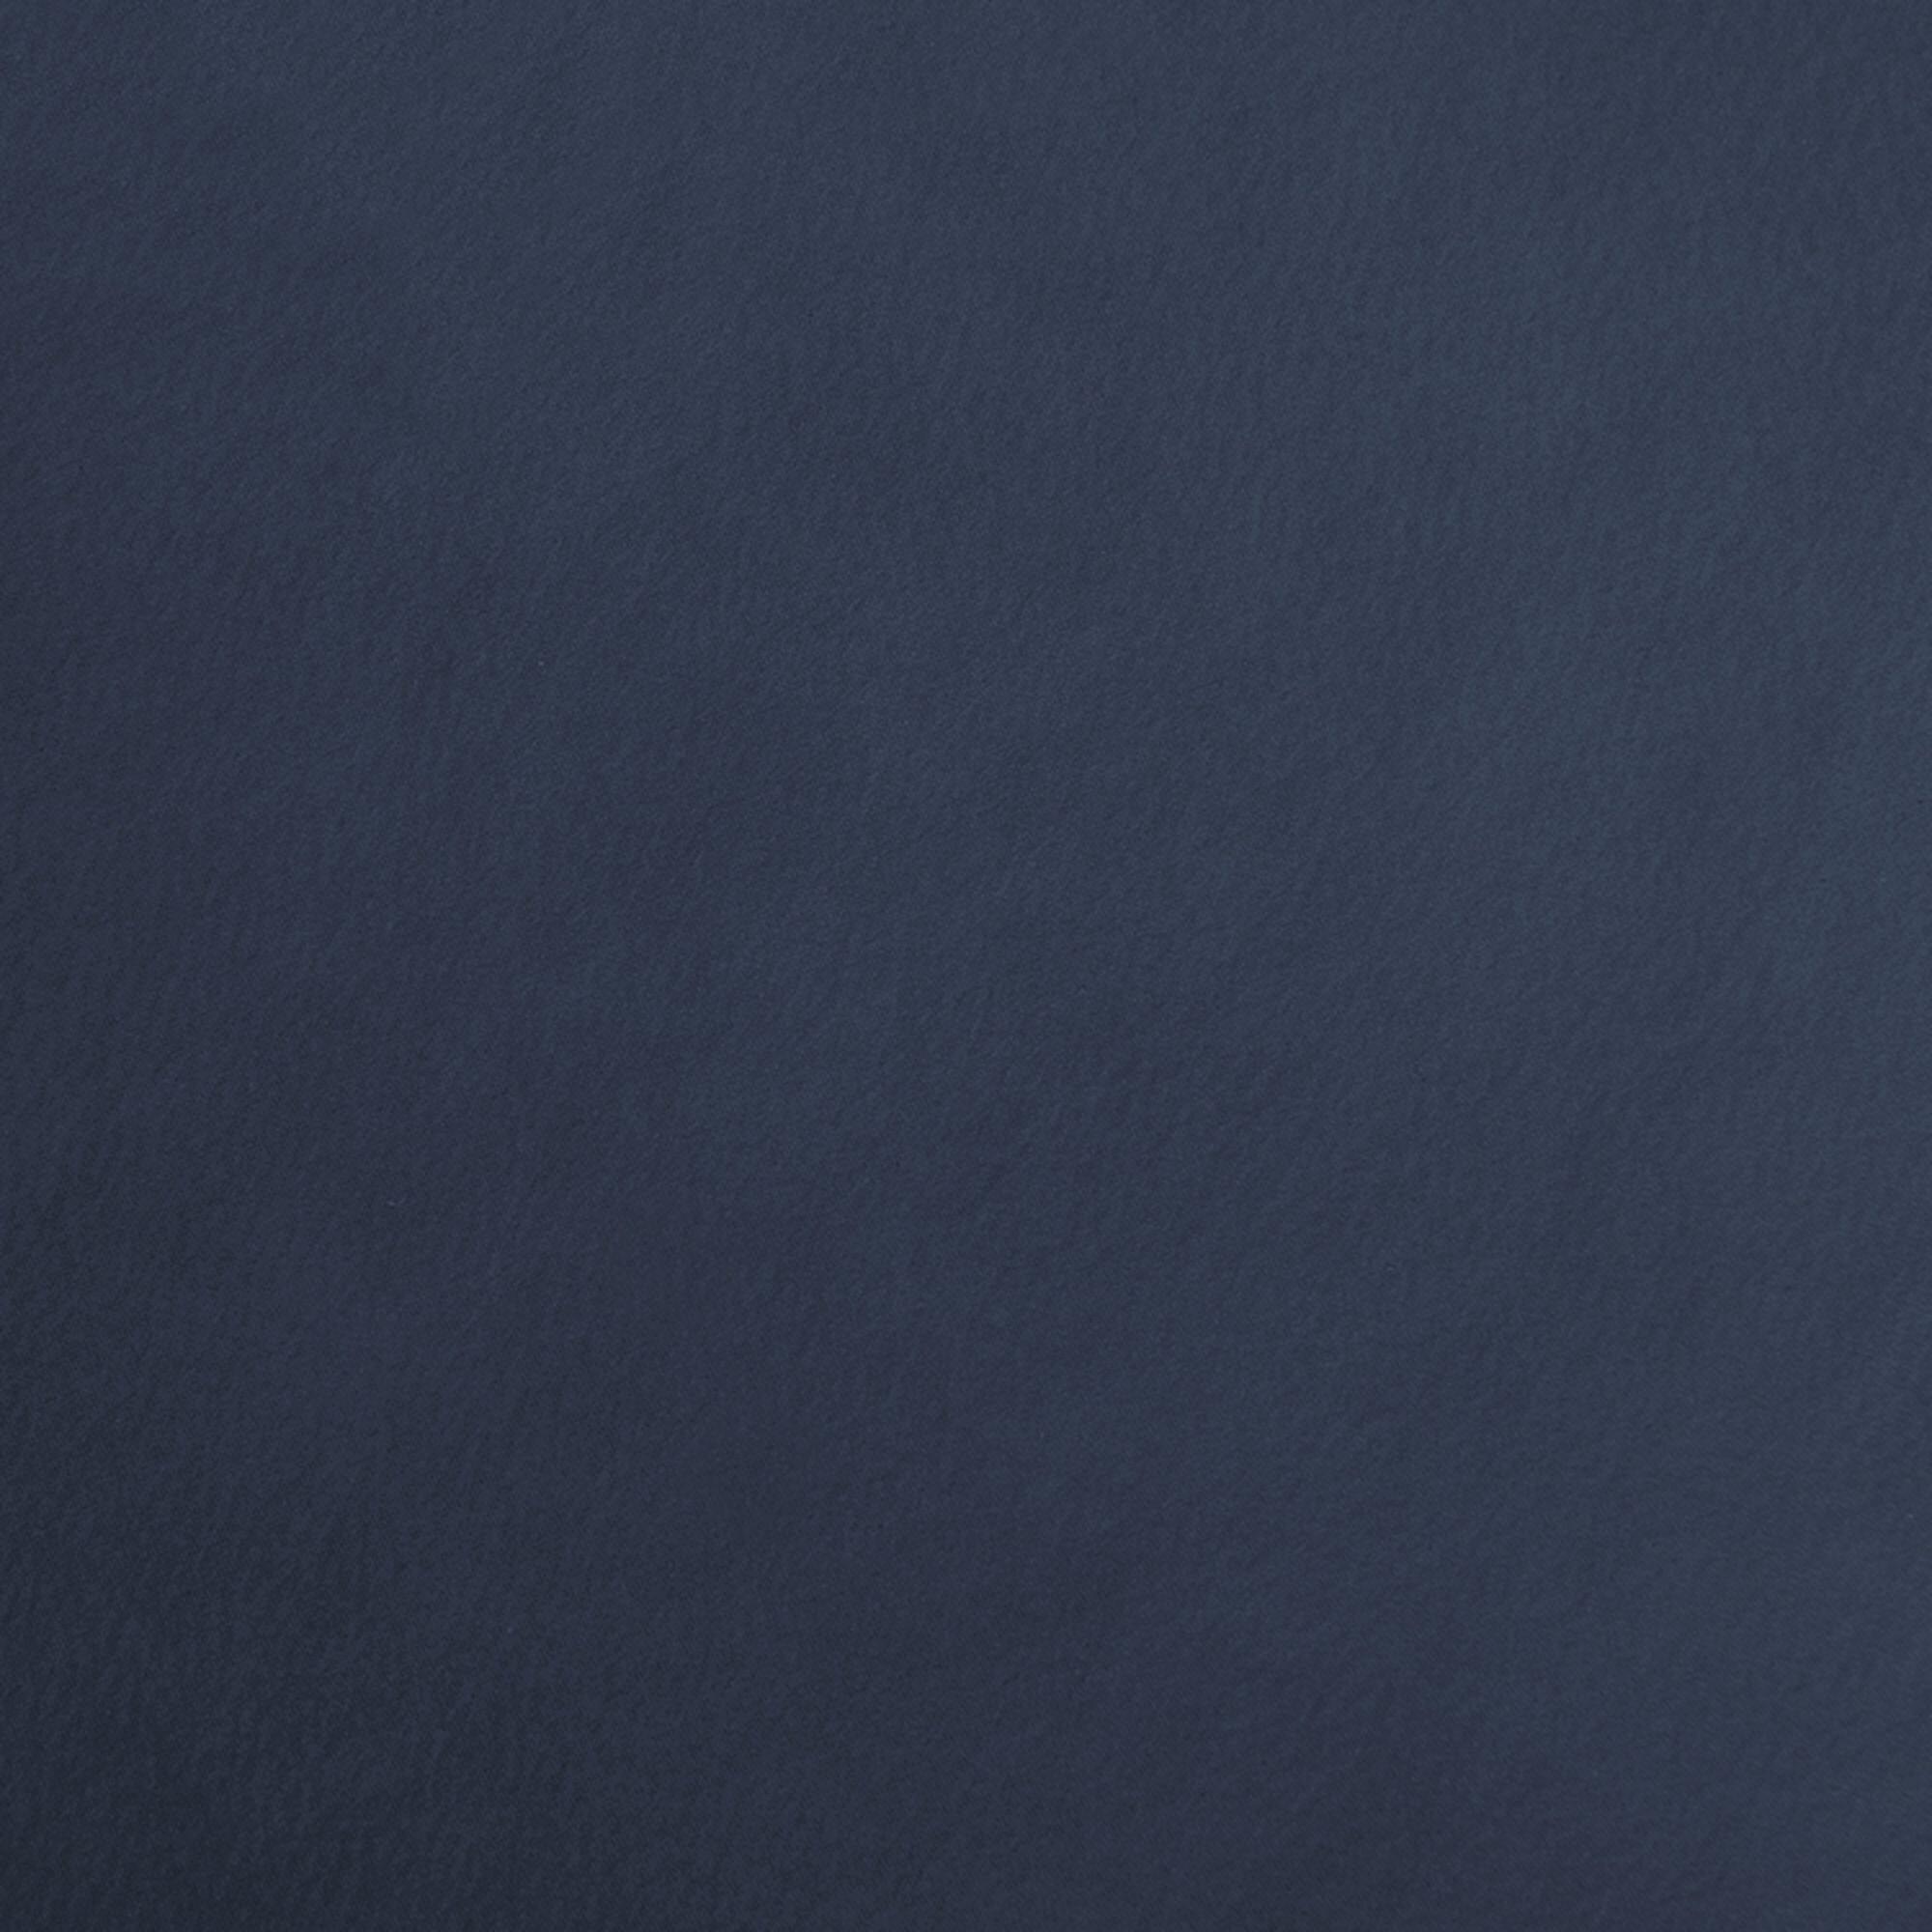 faux leather - blue